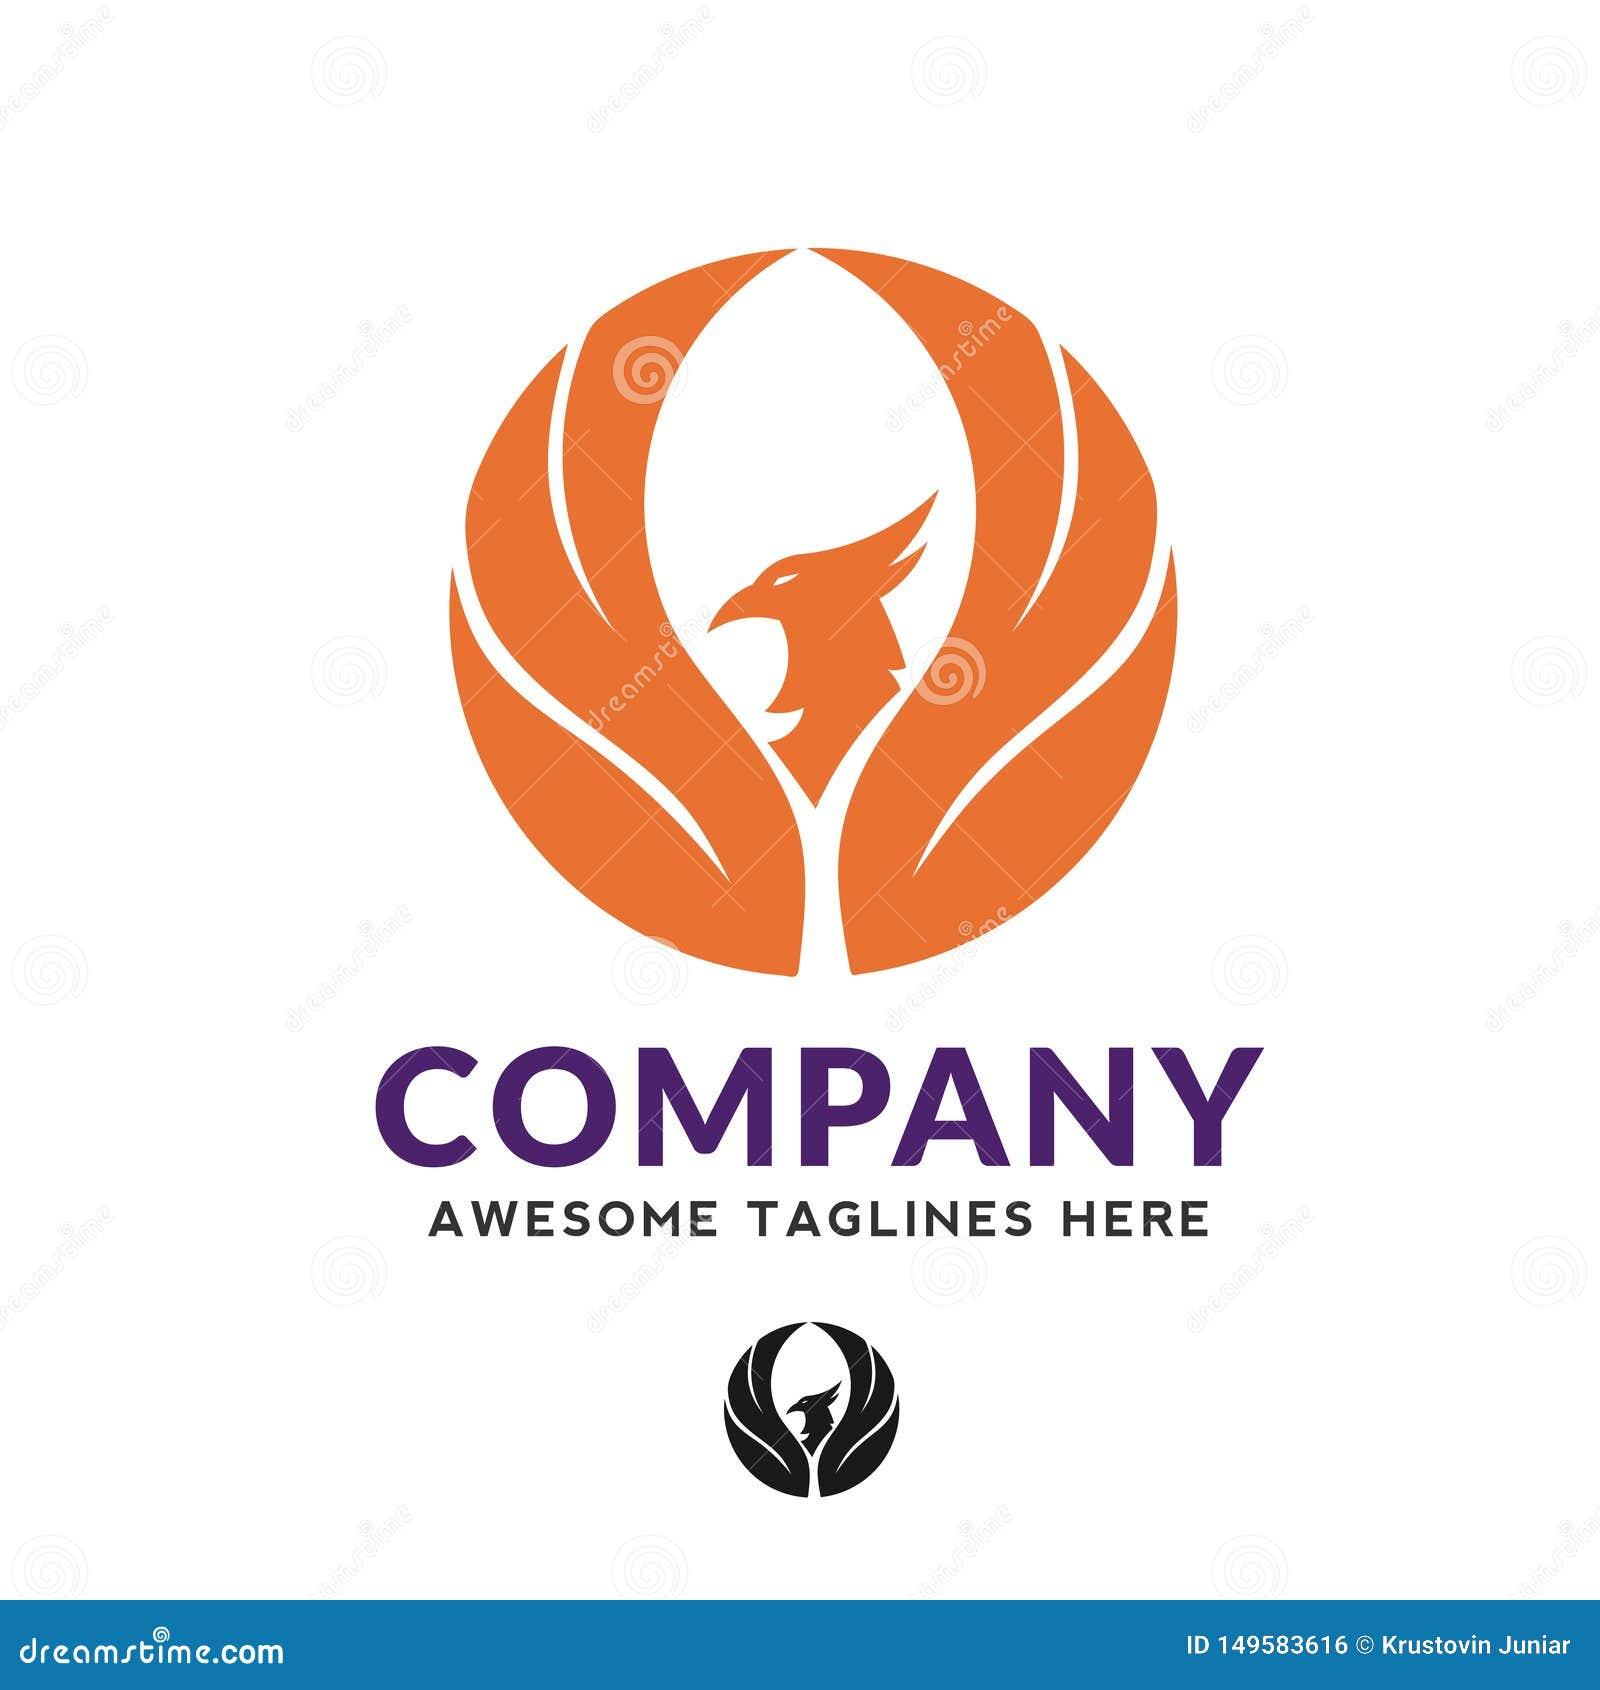 Pleasing Best Circle Phoenix Bird Logo Design Stock Vector Interior Design Ideas Inesswwsoteloinfo